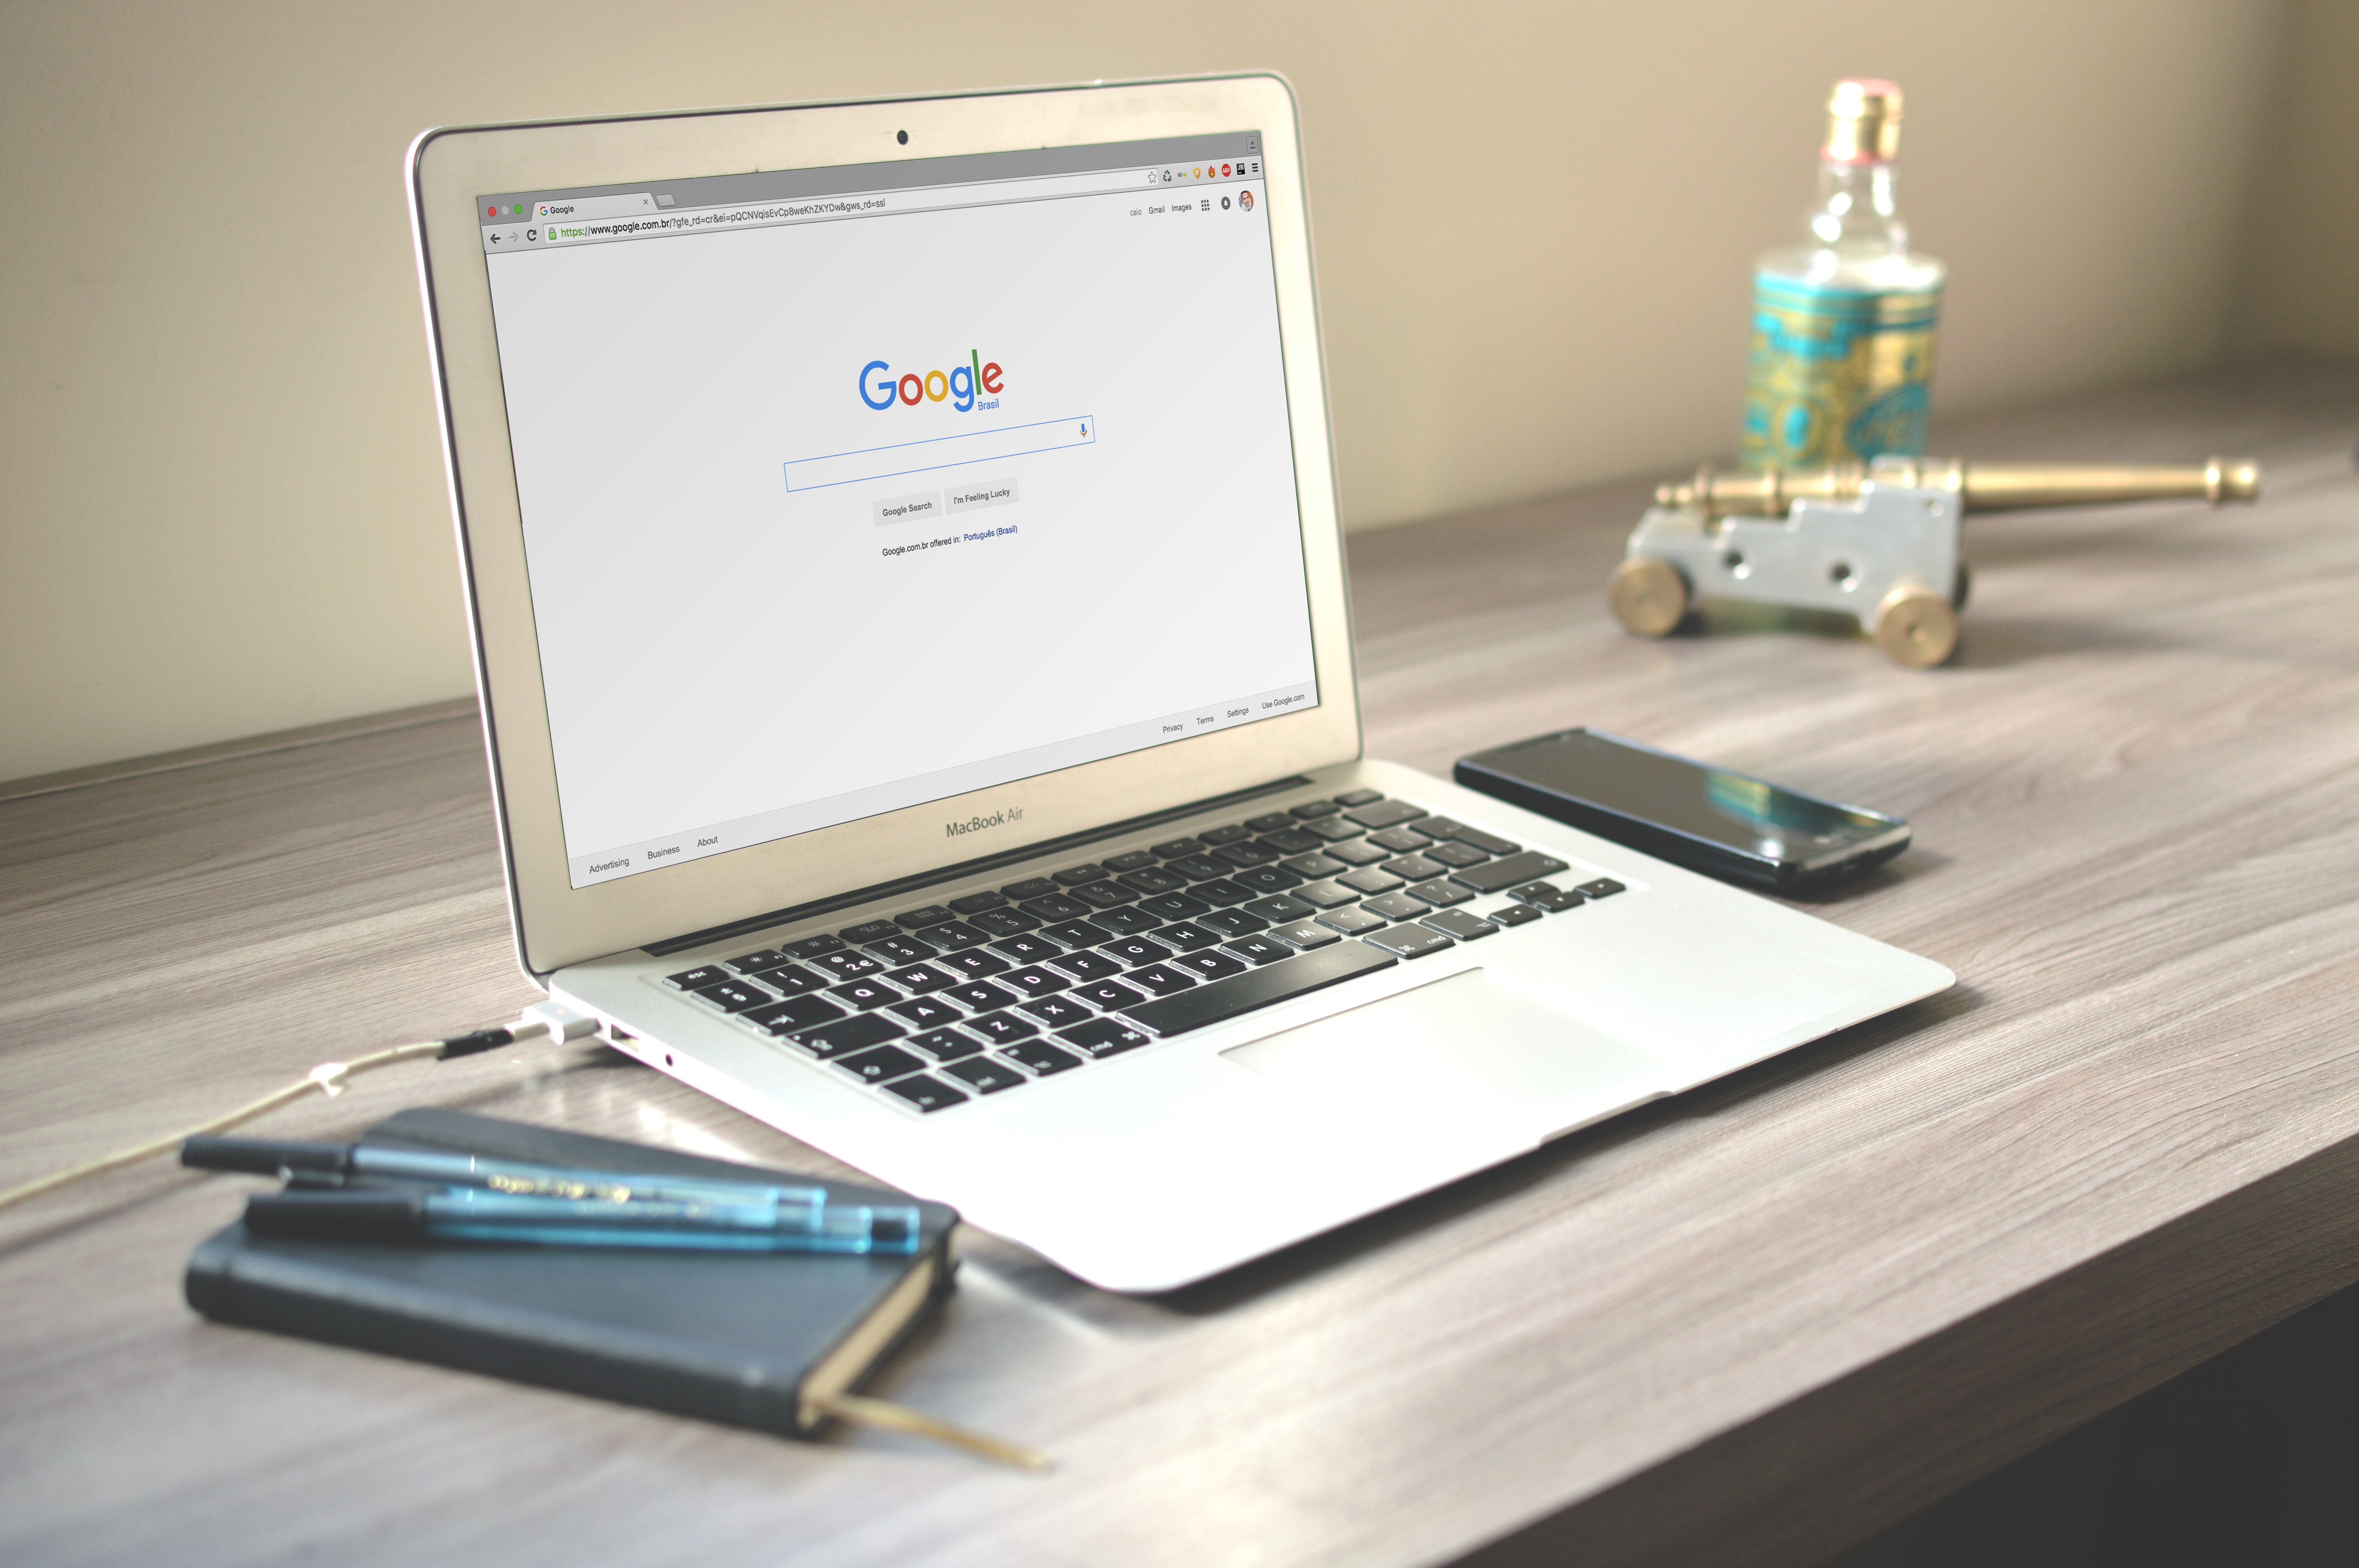 Cara mengetahui password yang tersimpan di Chrome